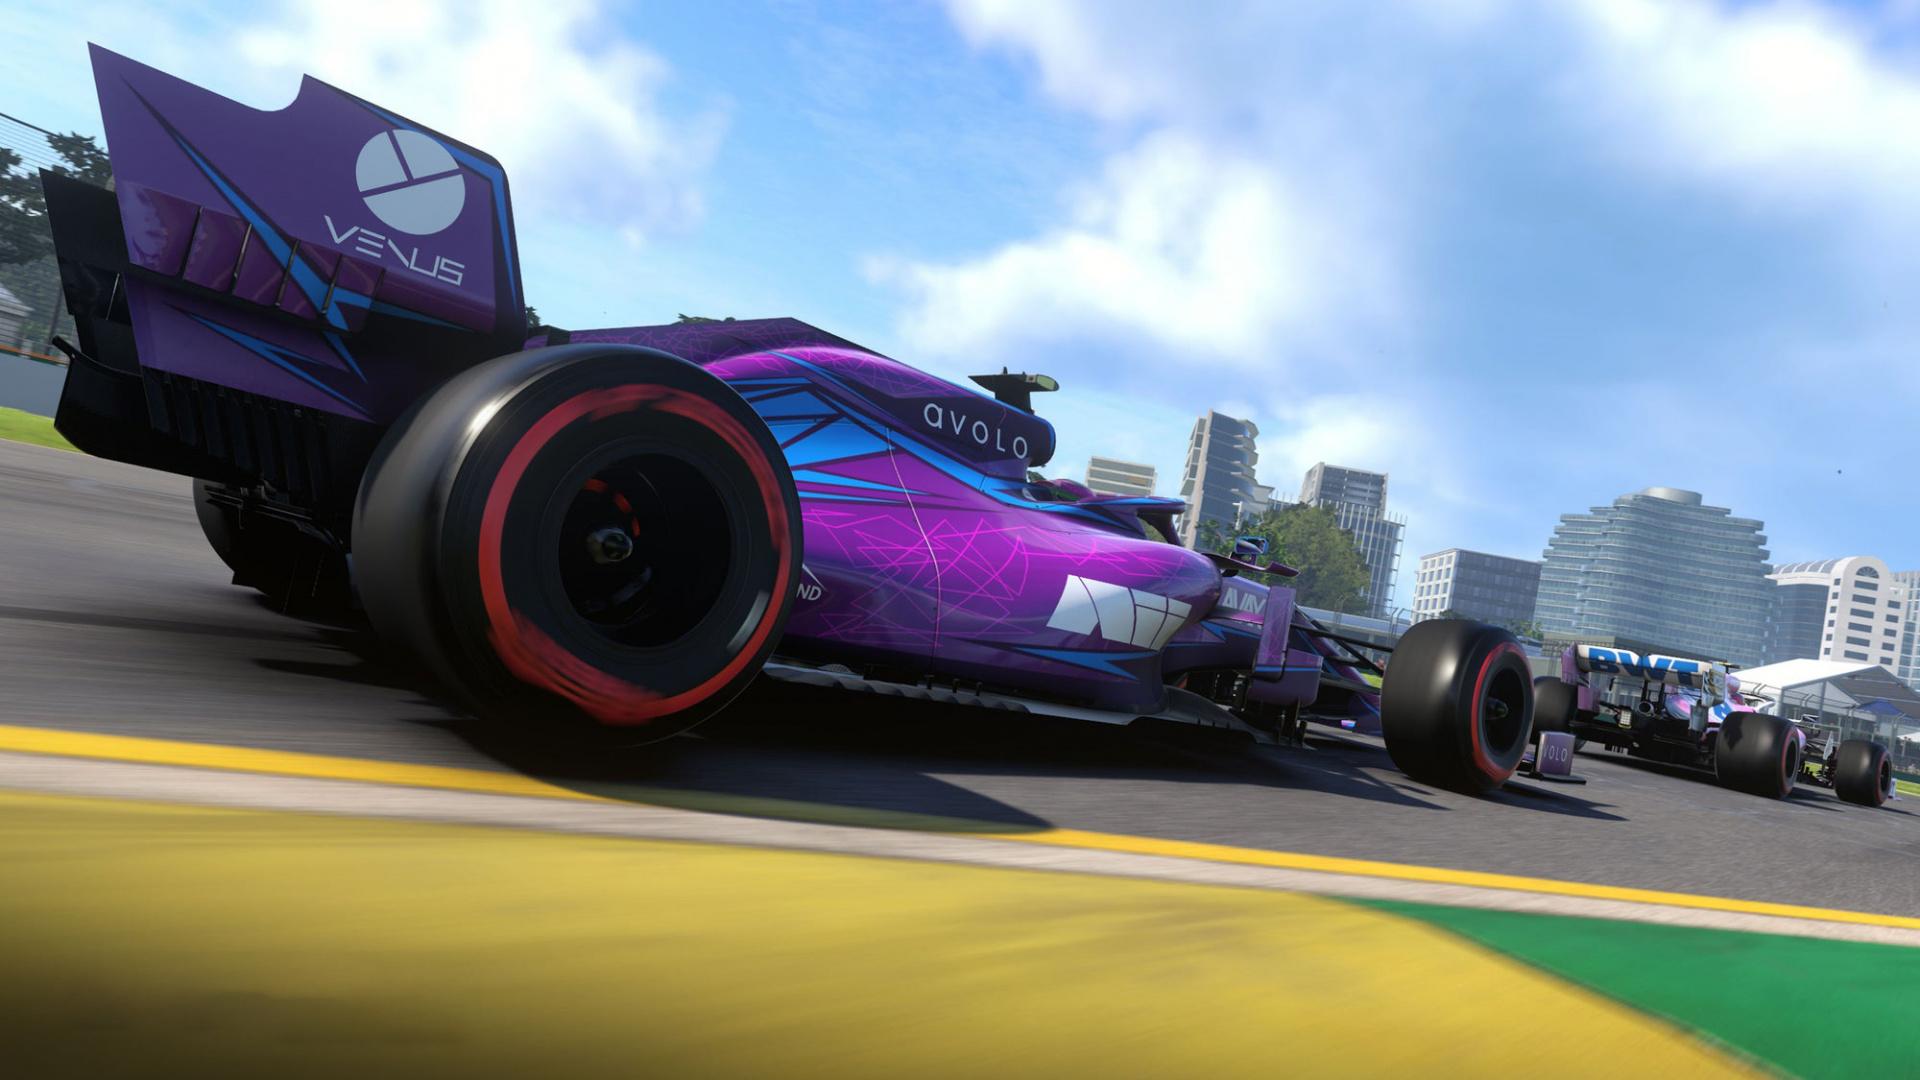 F1 2020 получила бесплатную пробную версию на PS4 и Xbox One